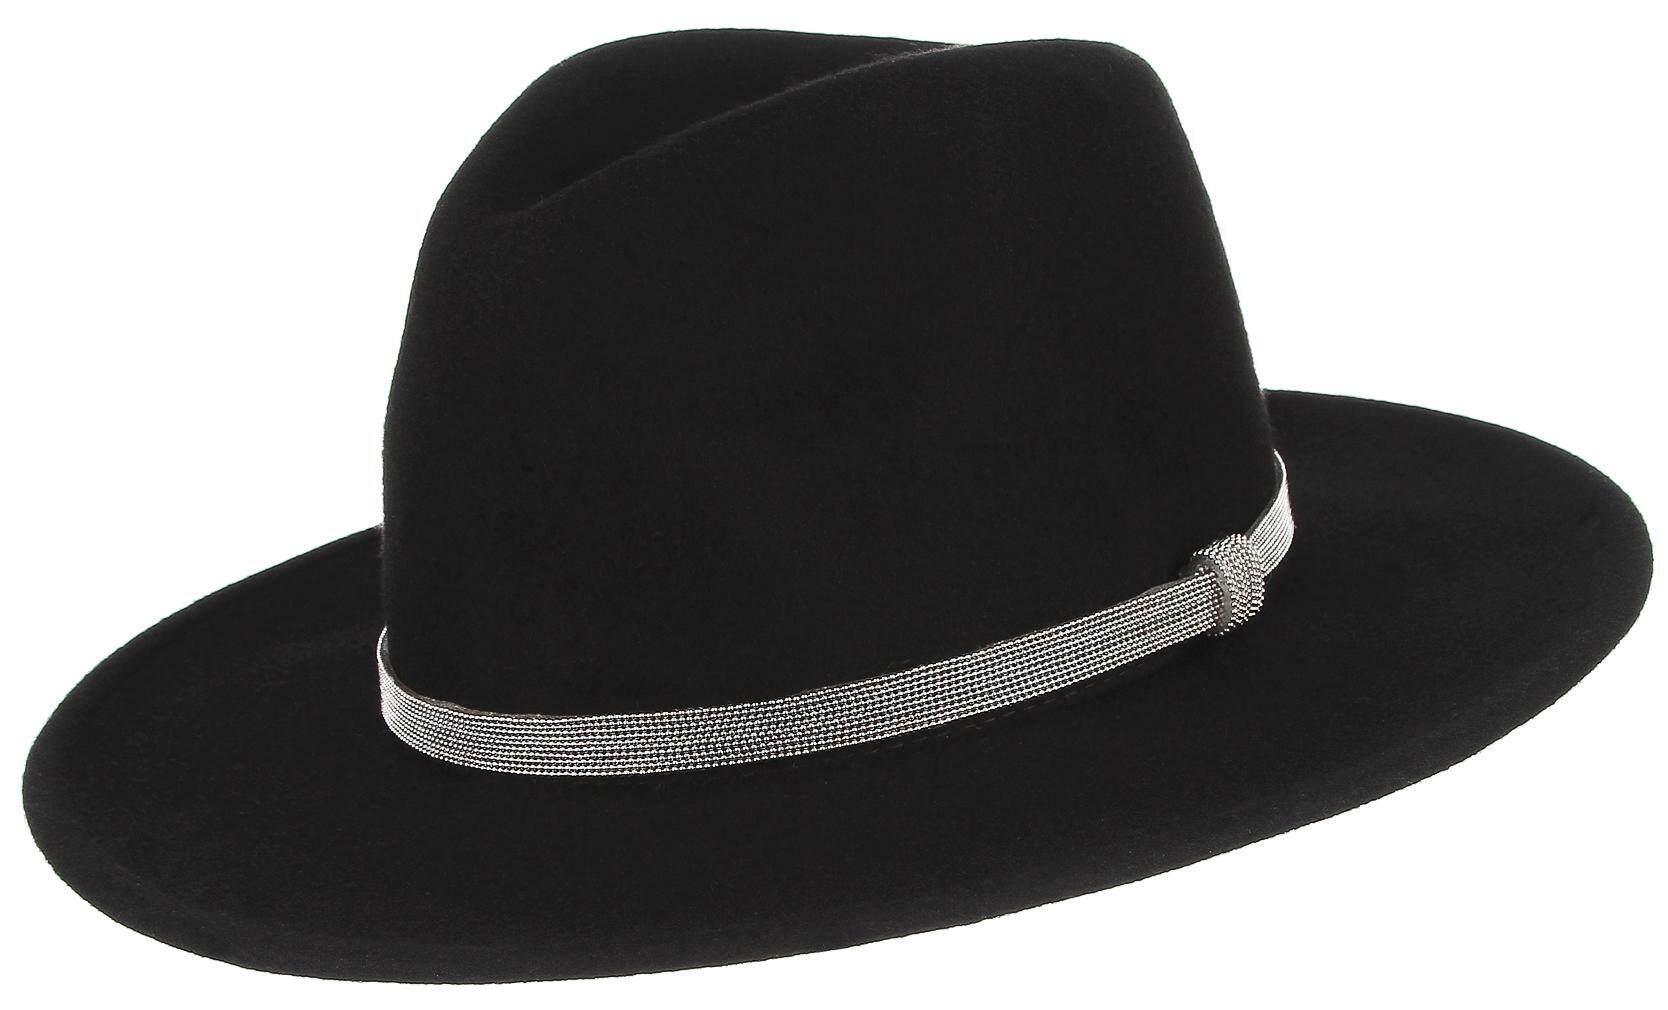 2a55dc4a6 Men's British Chain Decoration 100% Pure Wool Hat Fedora Hats Wide Brim  Trilby Hat